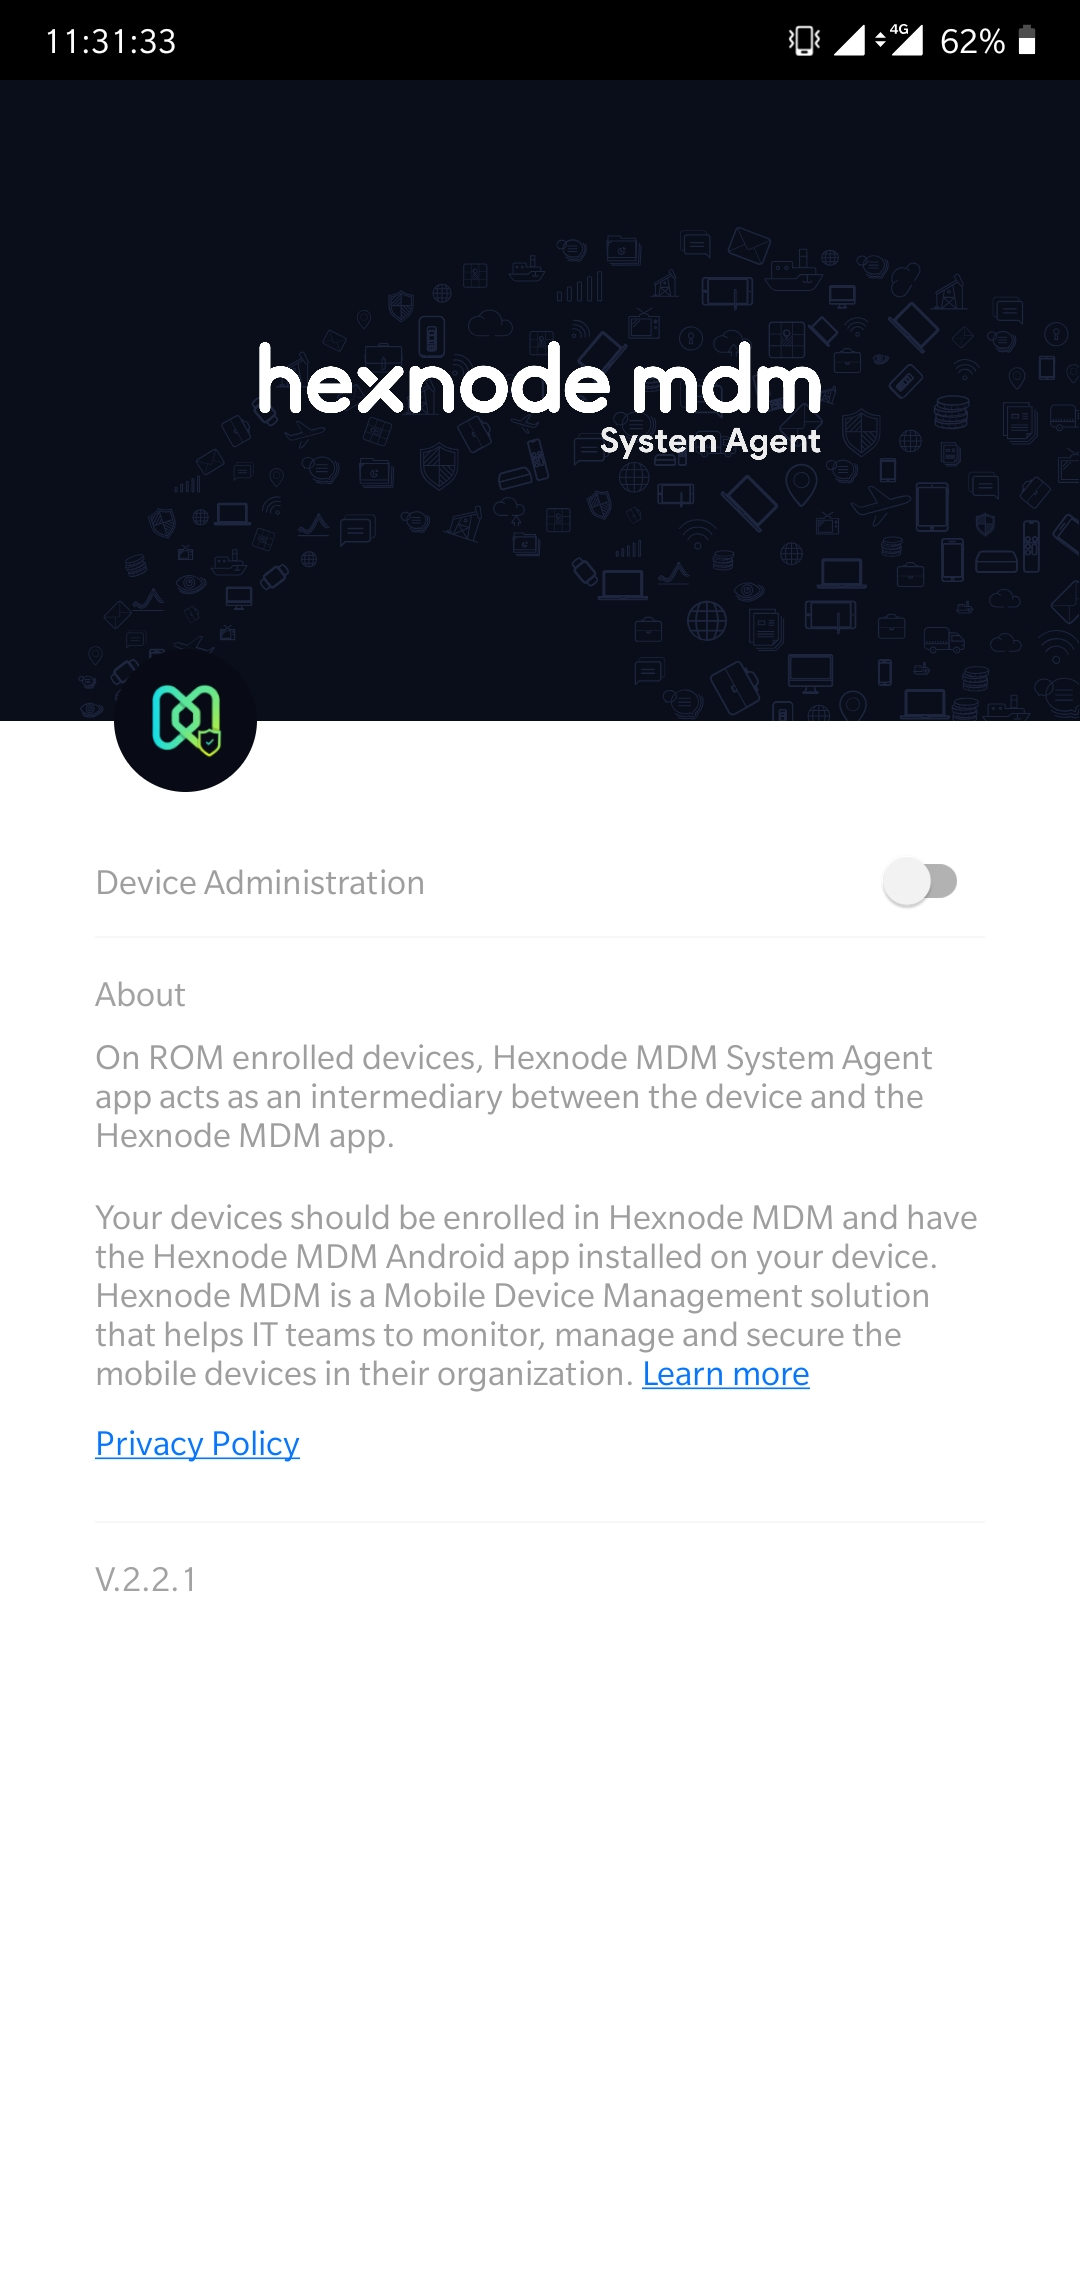 System Agent App